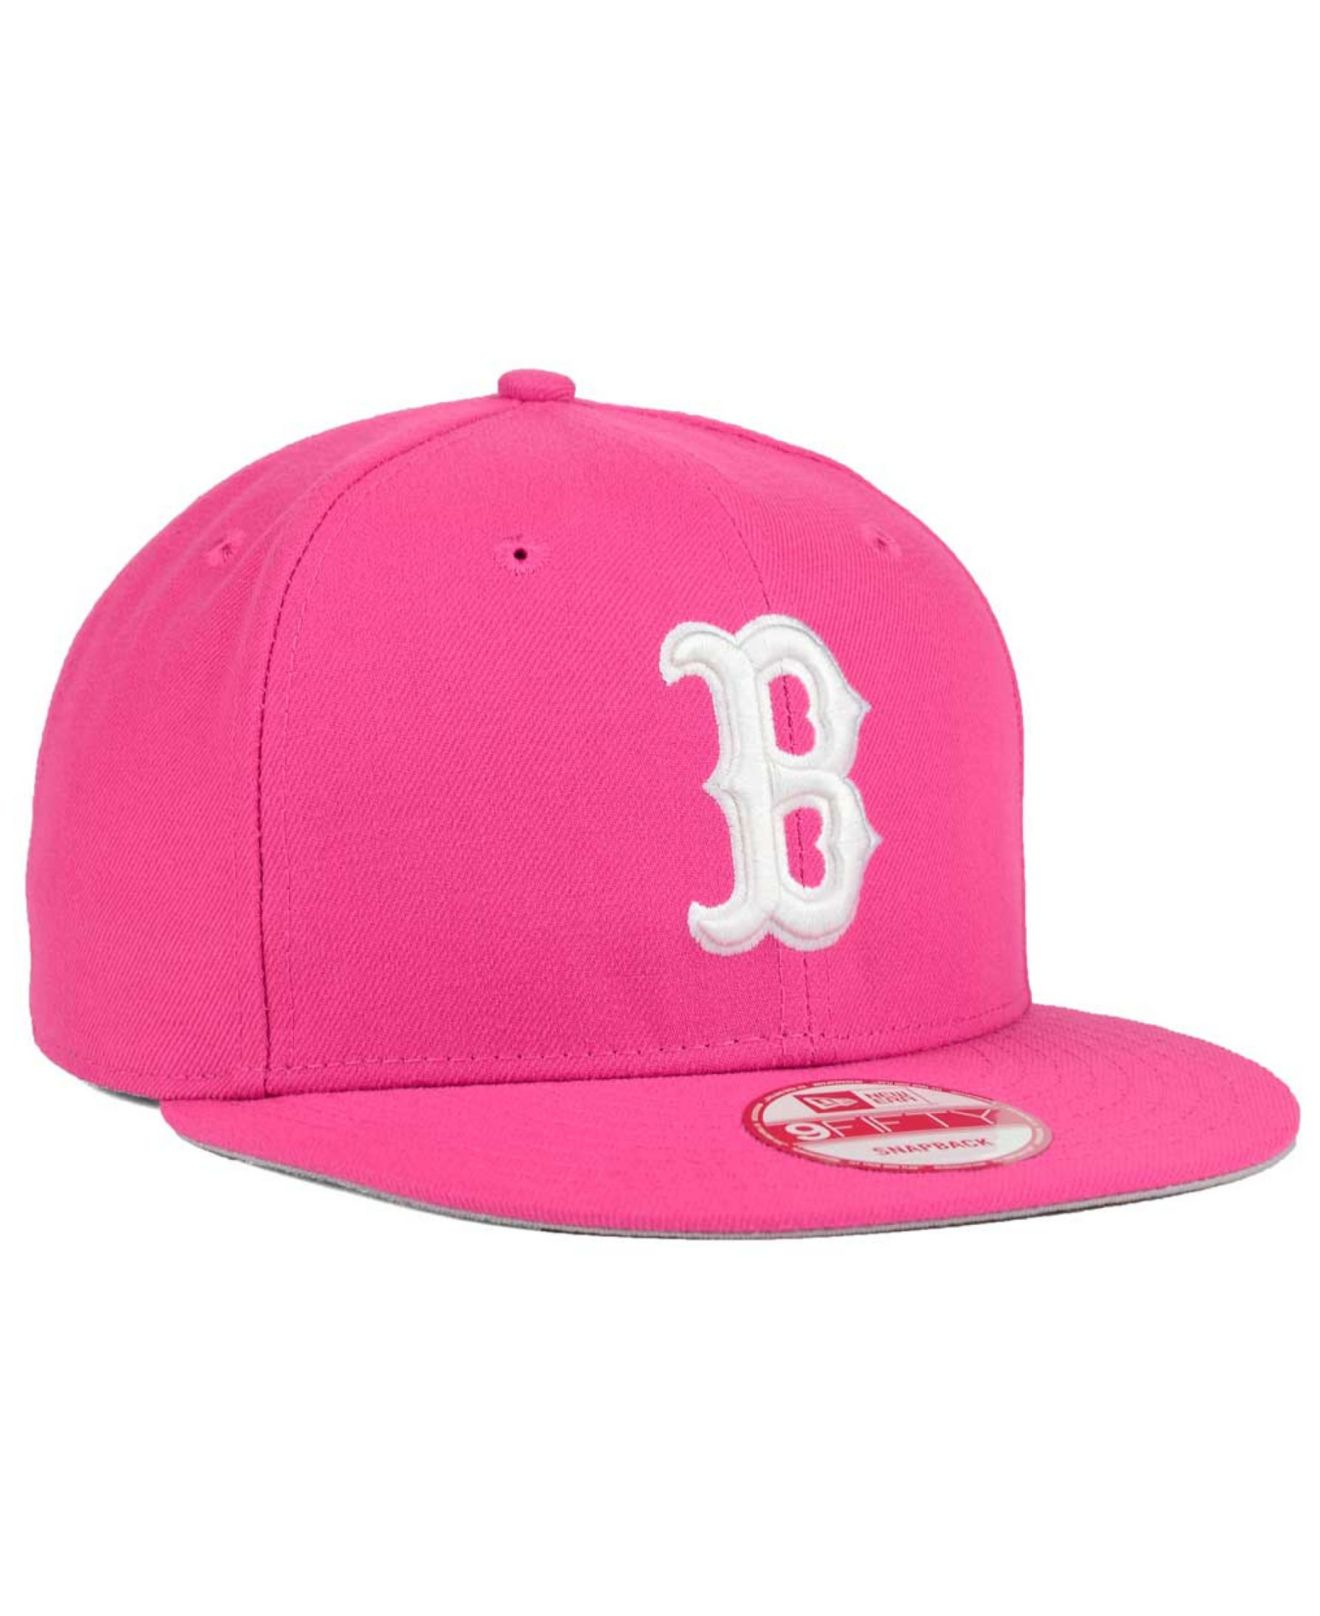 purchase cheap 9dfd4 fb9c6 ... czech lyst ktz boston red sox c dub 9fifty snapback cap in pink for men  ff60e ...